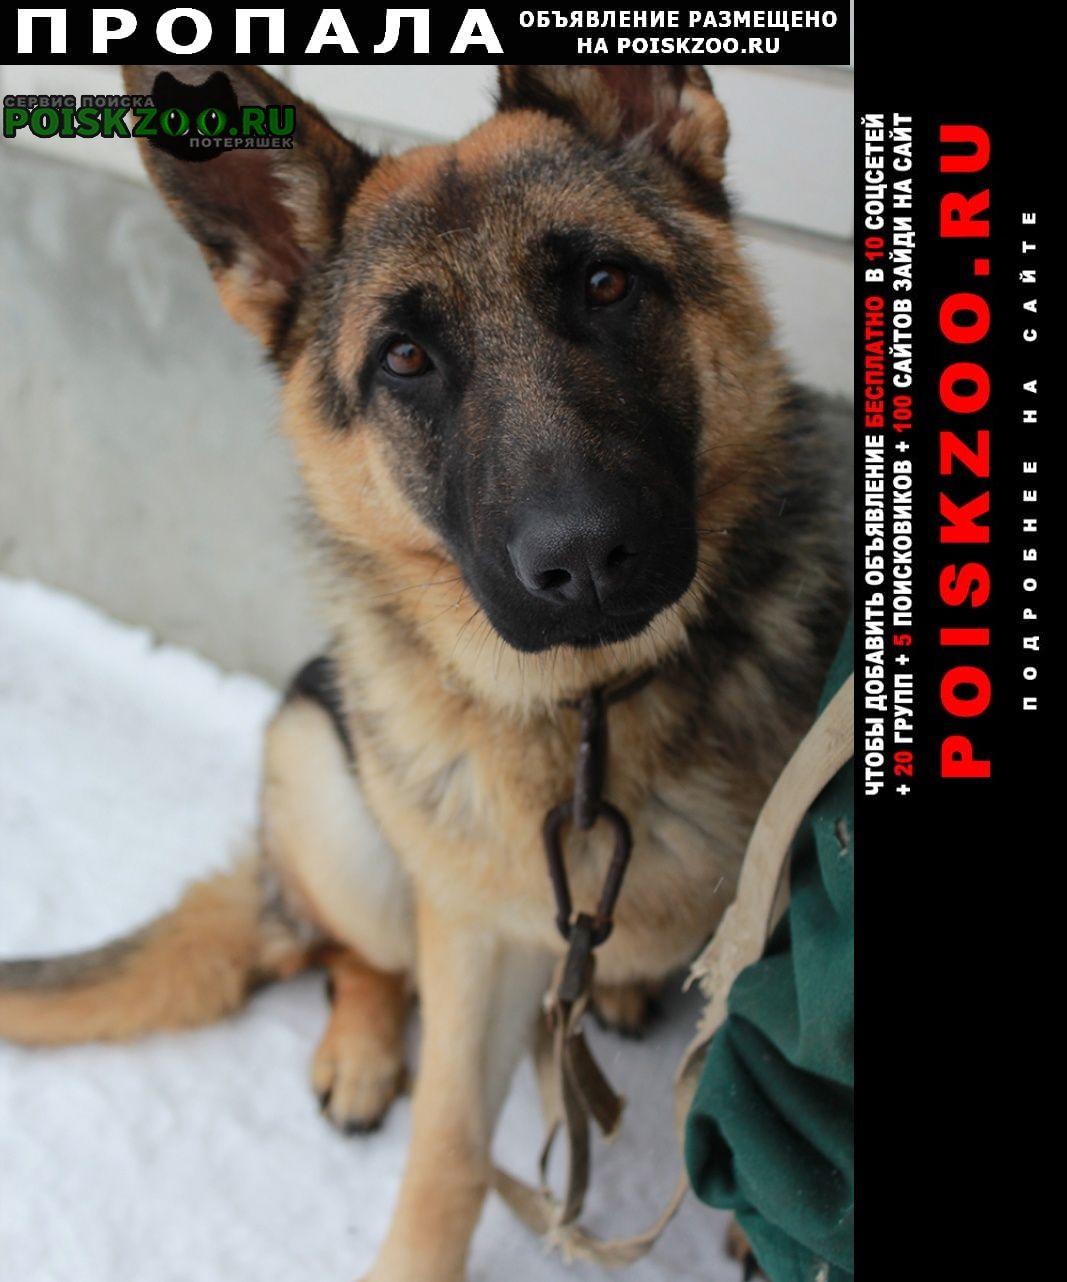 Пропала собака Калининск